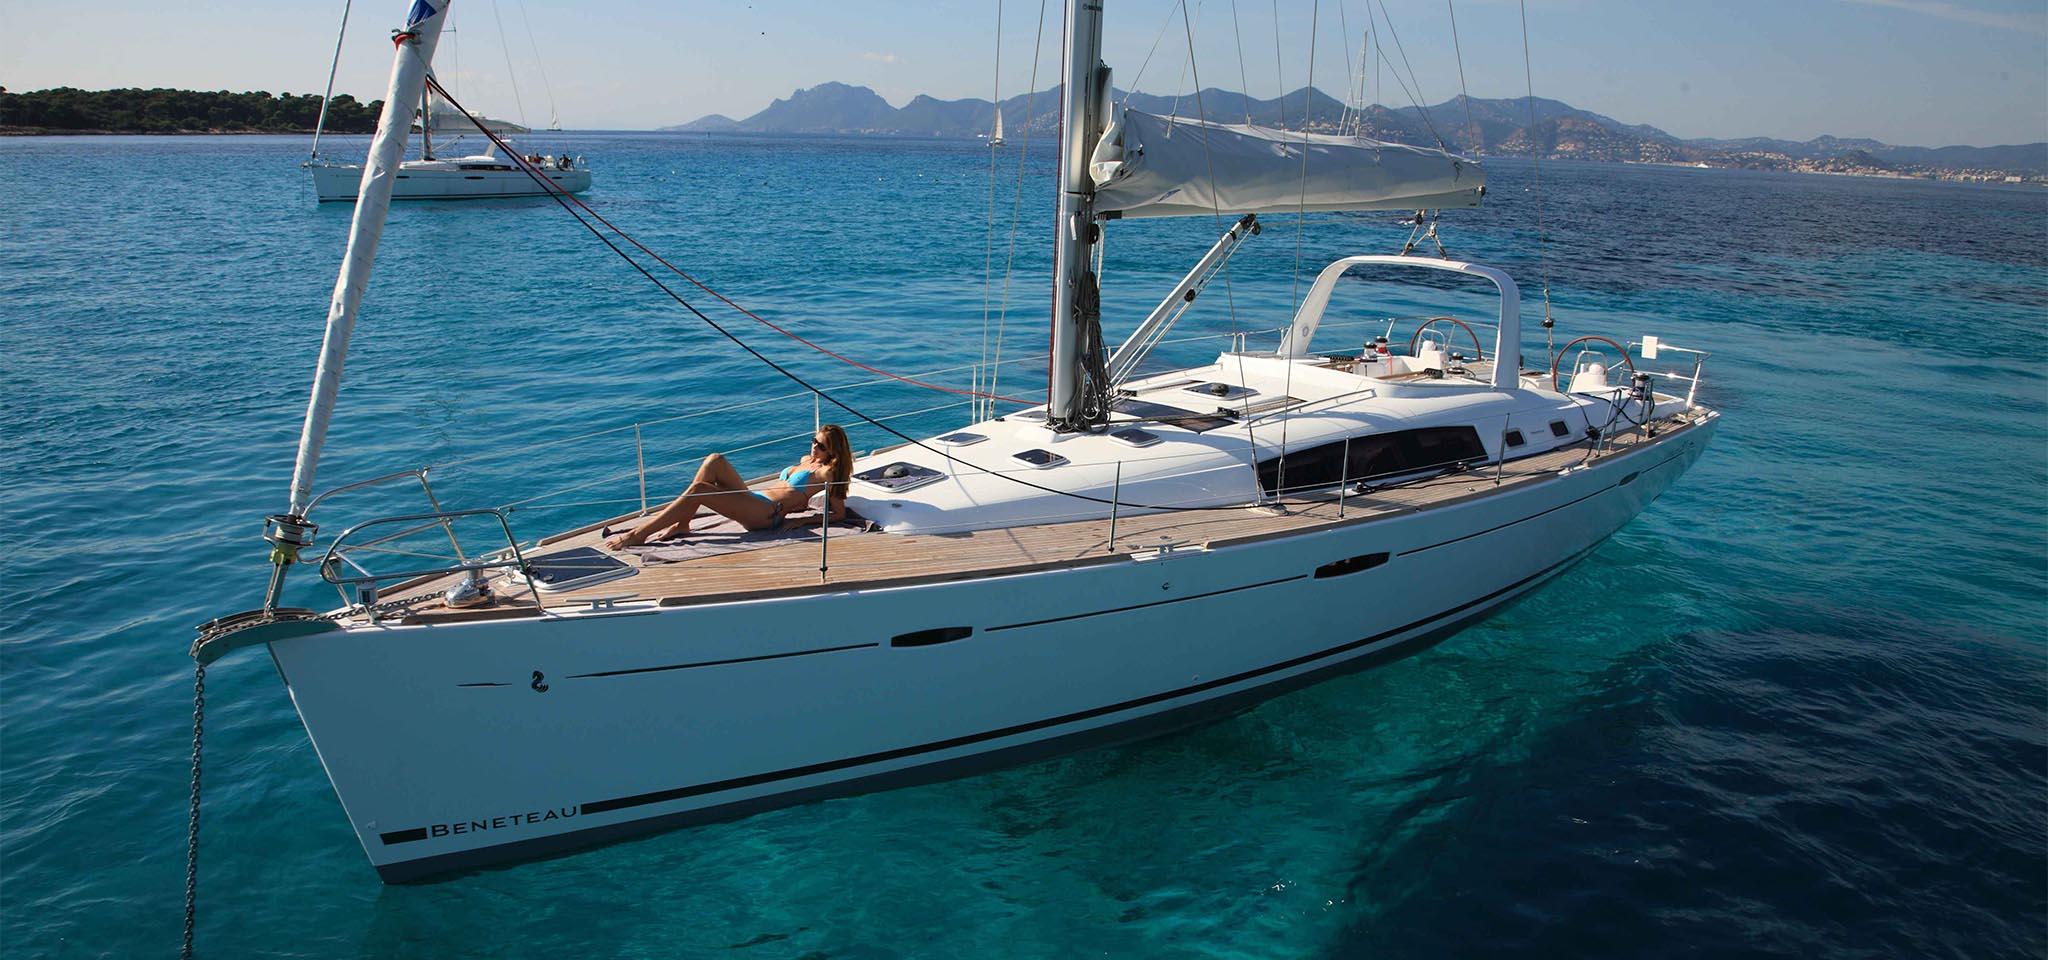 Bareboat Yacht Charter, Bareboat Sailing Yacht Charter